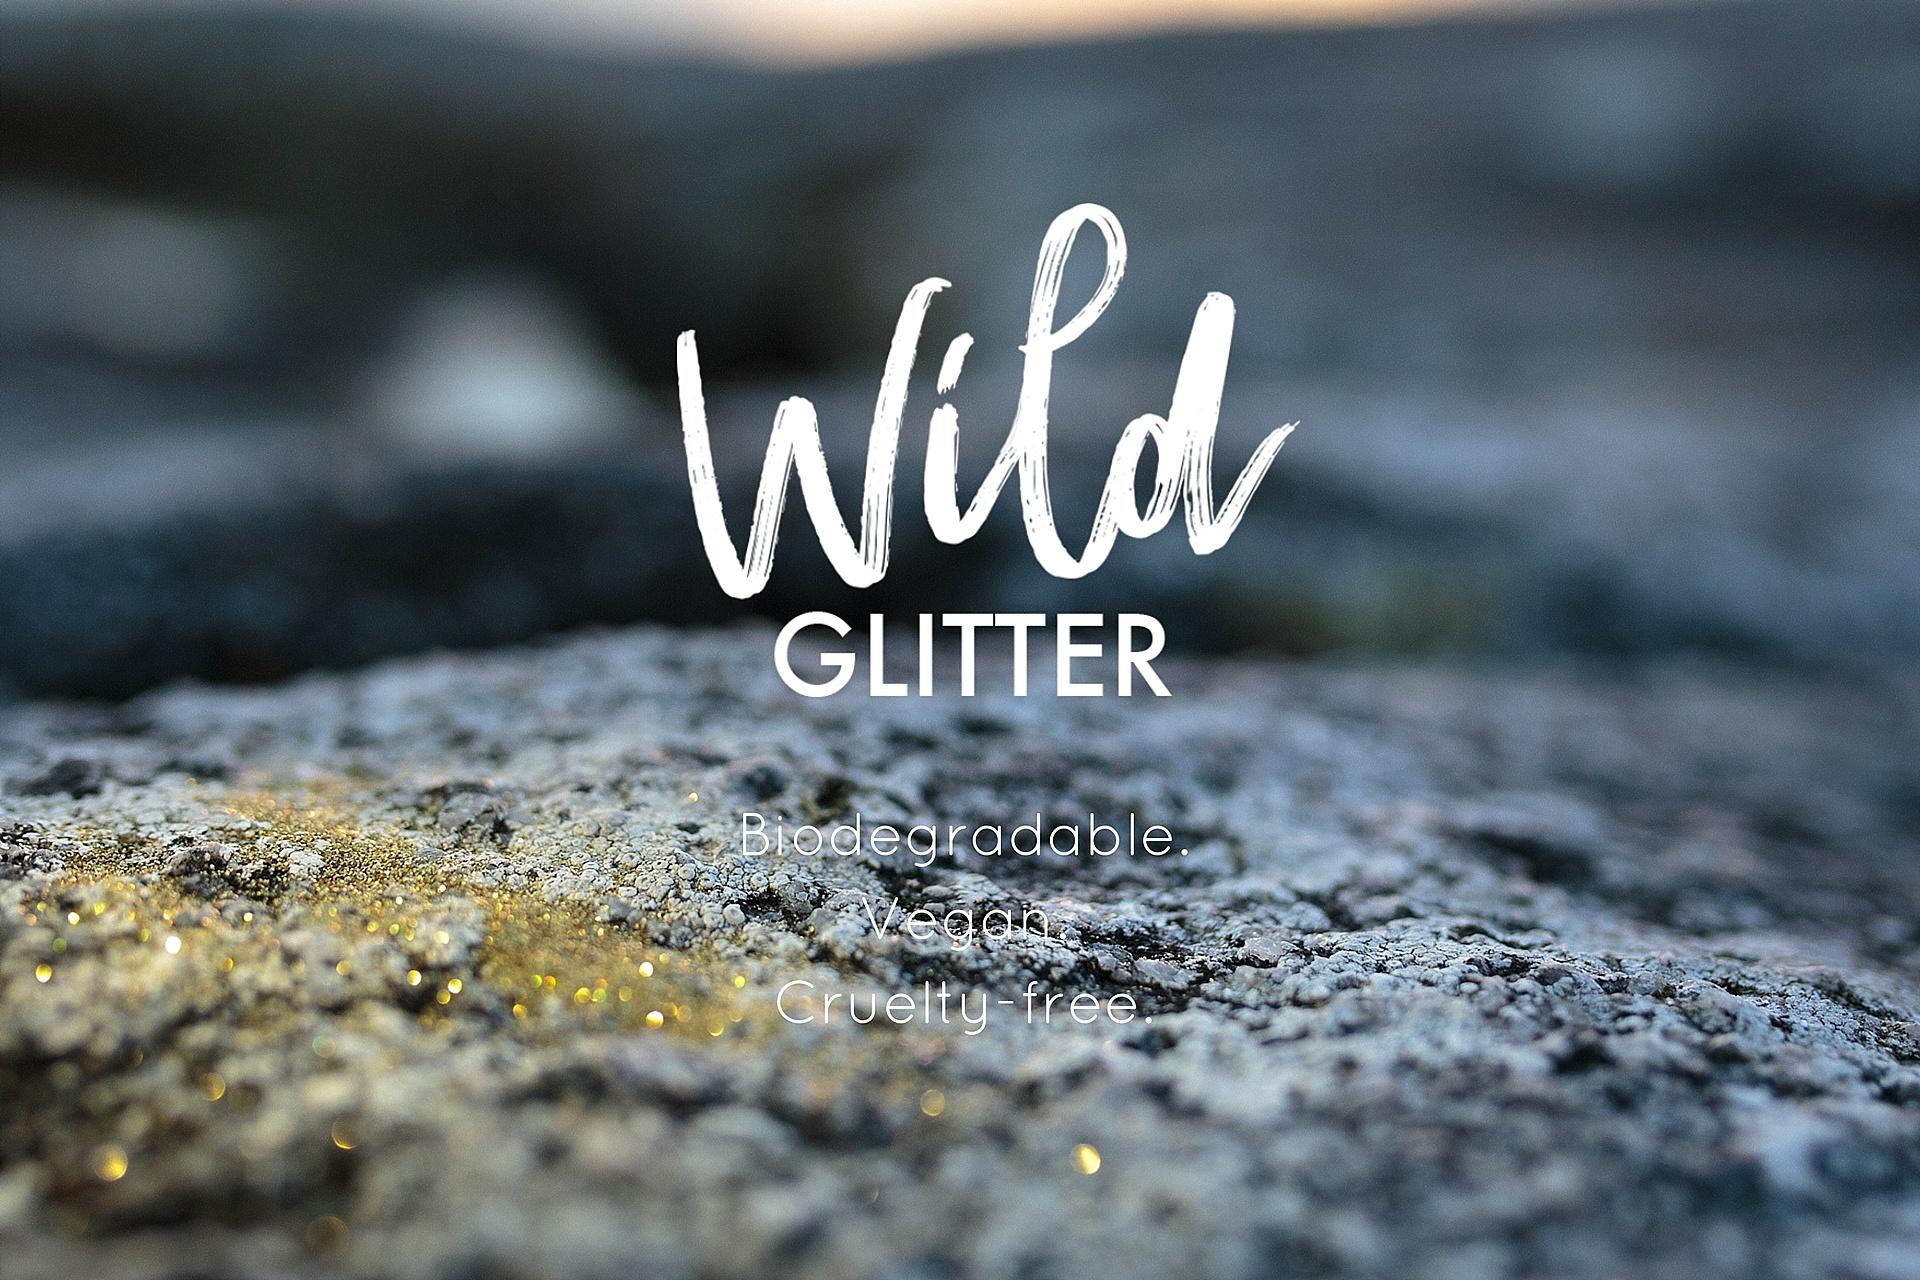 Biodegradable_Glitter_wedding_favours.jpg